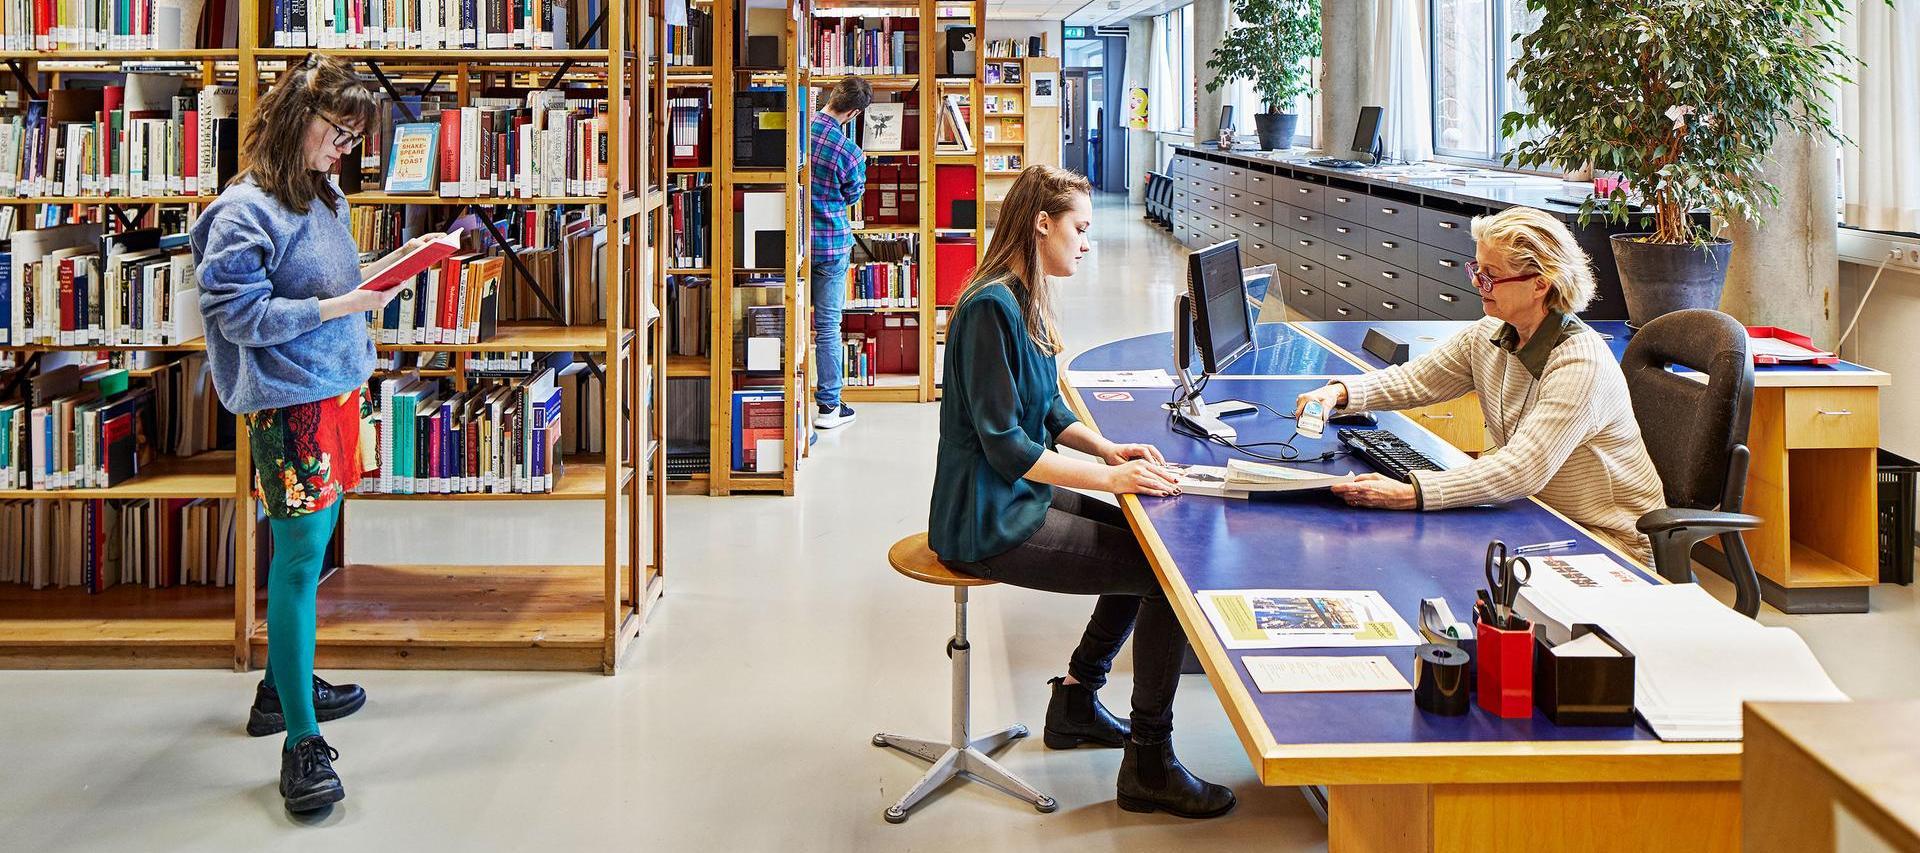 Library - Amsterdam University of the Arts - AHK